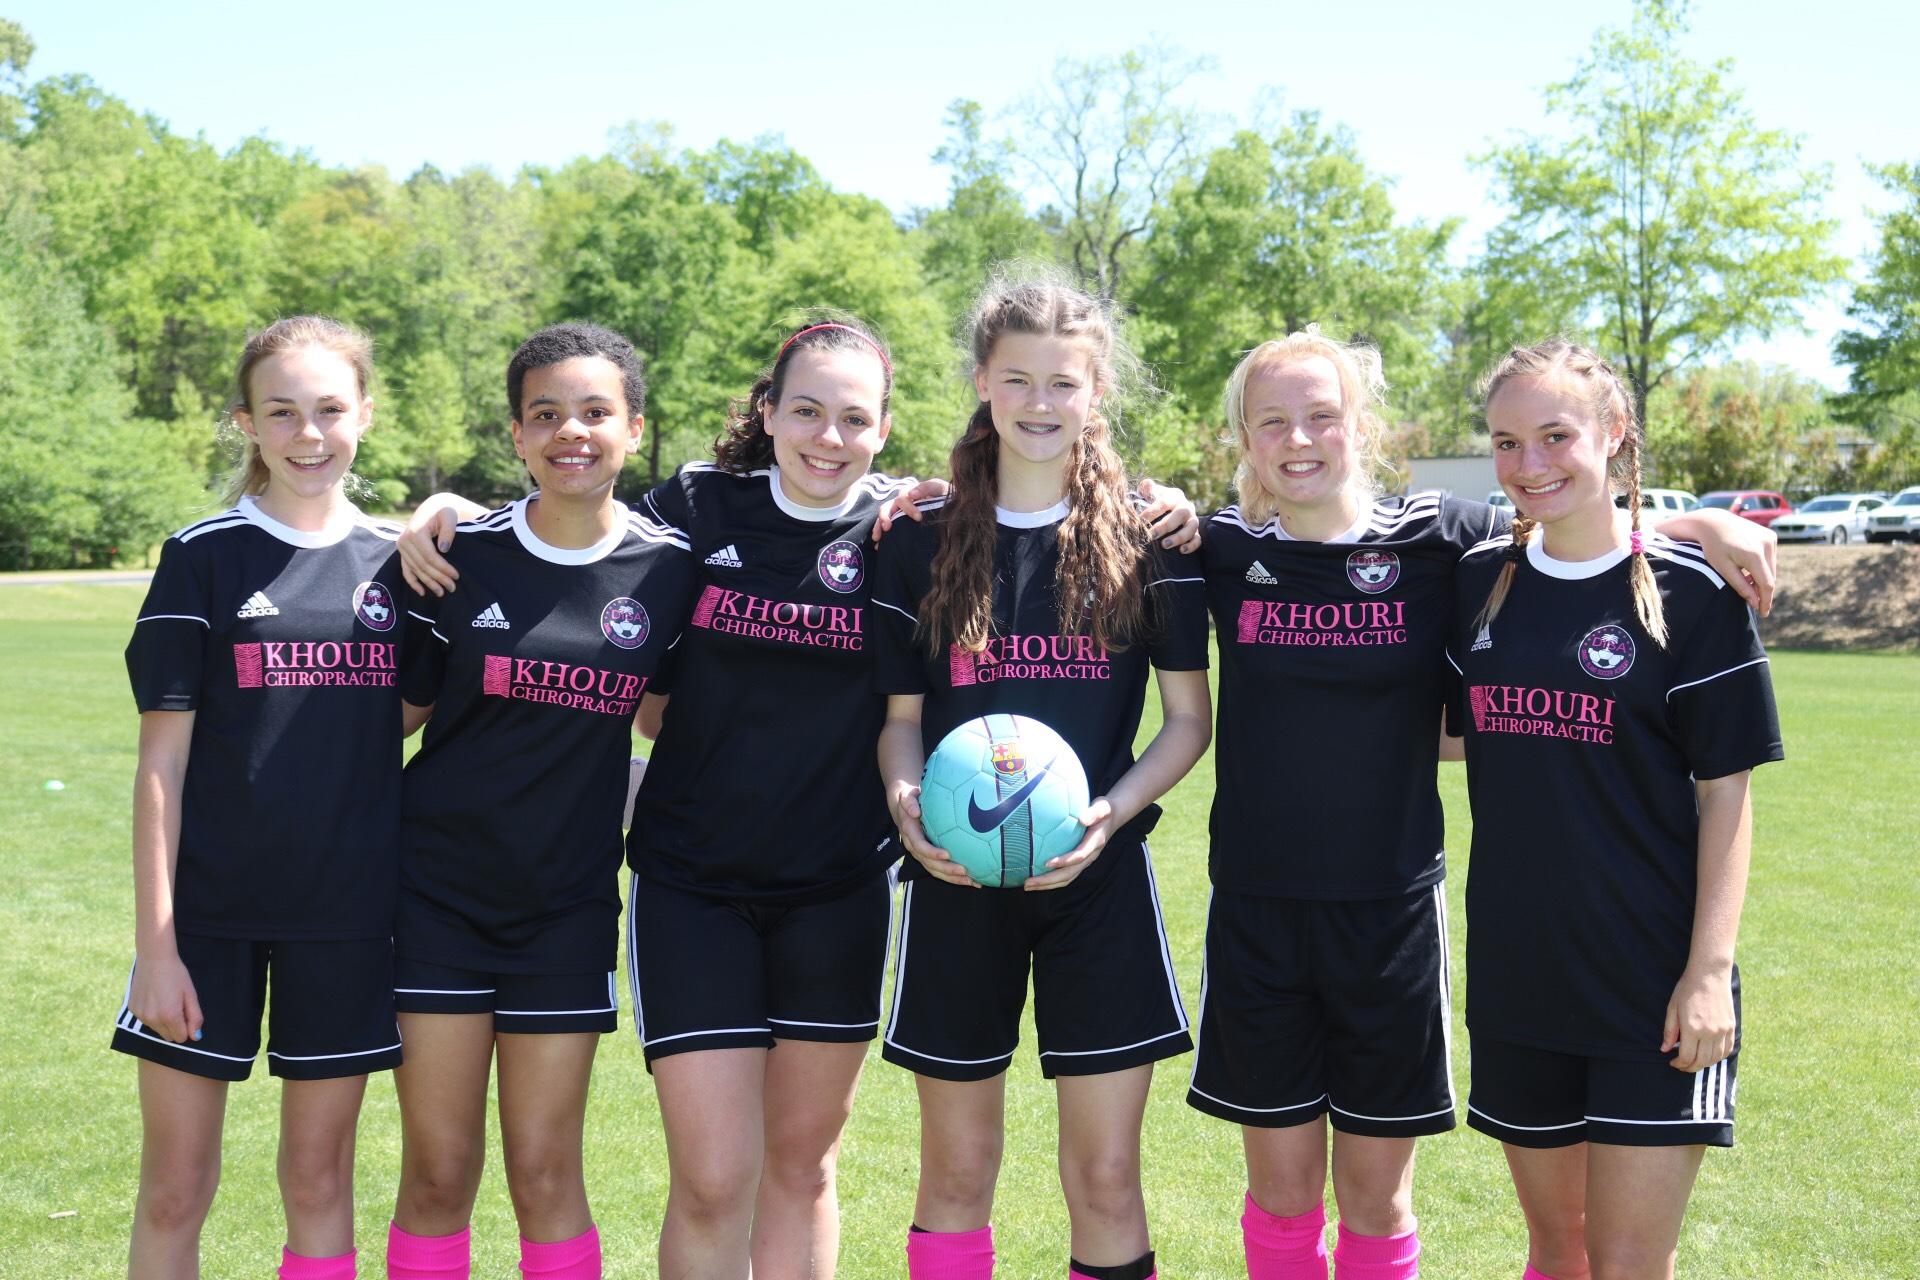 The Gators' defensive players (left to right): Meredith McDonald, Gabby Hylton, Cecilia Ollis, Emma Darnell, Morgan Davis and Morgan Ramsey.